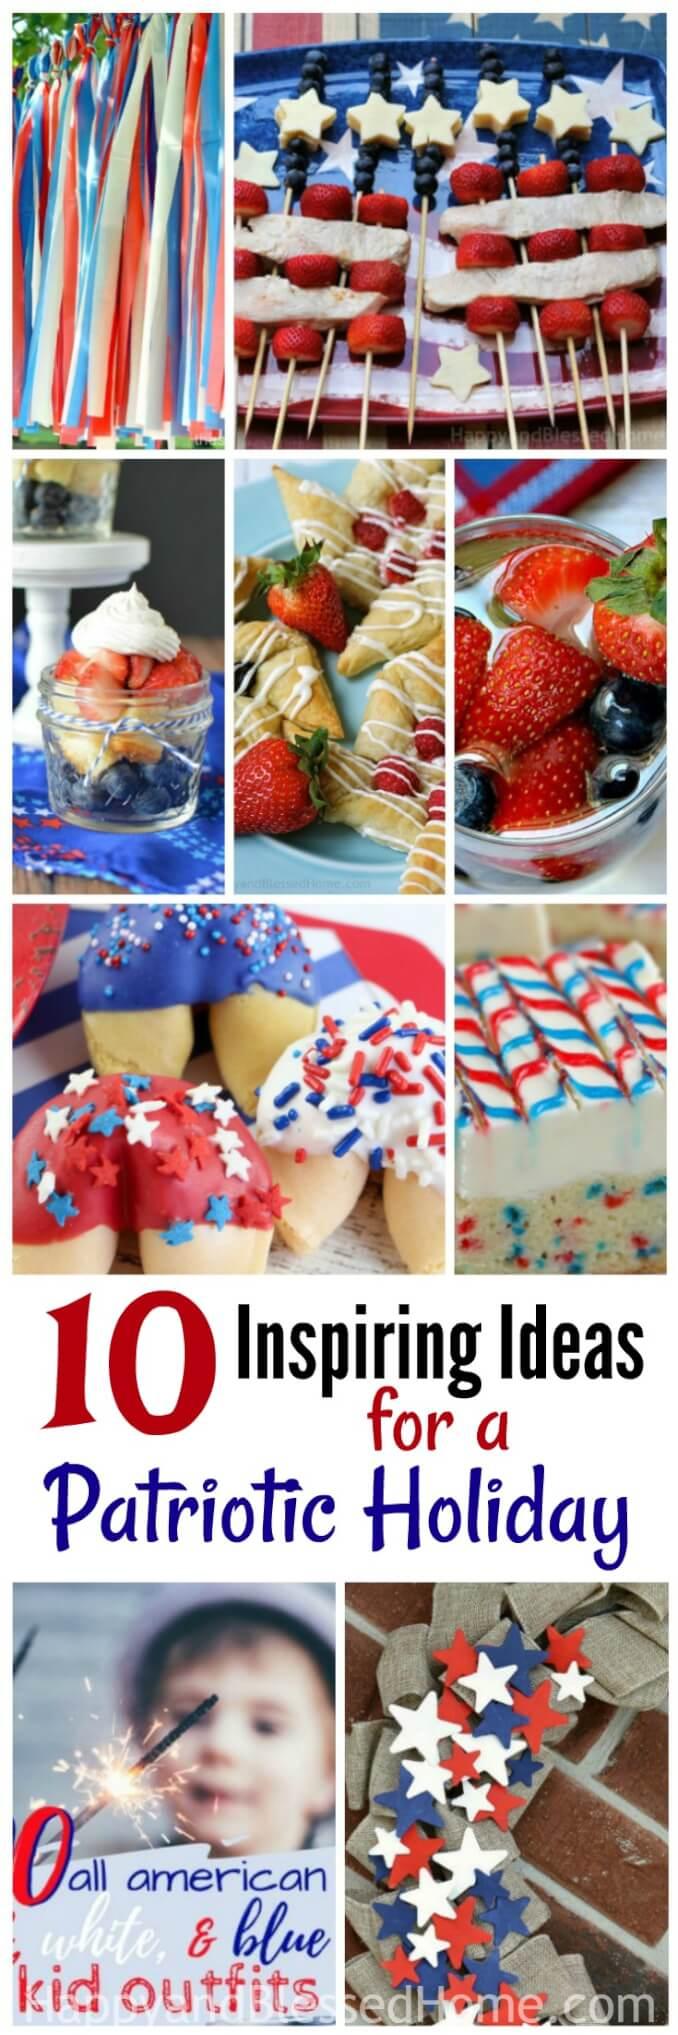 10 Inspiring Ideas for a Patriotic Holiday